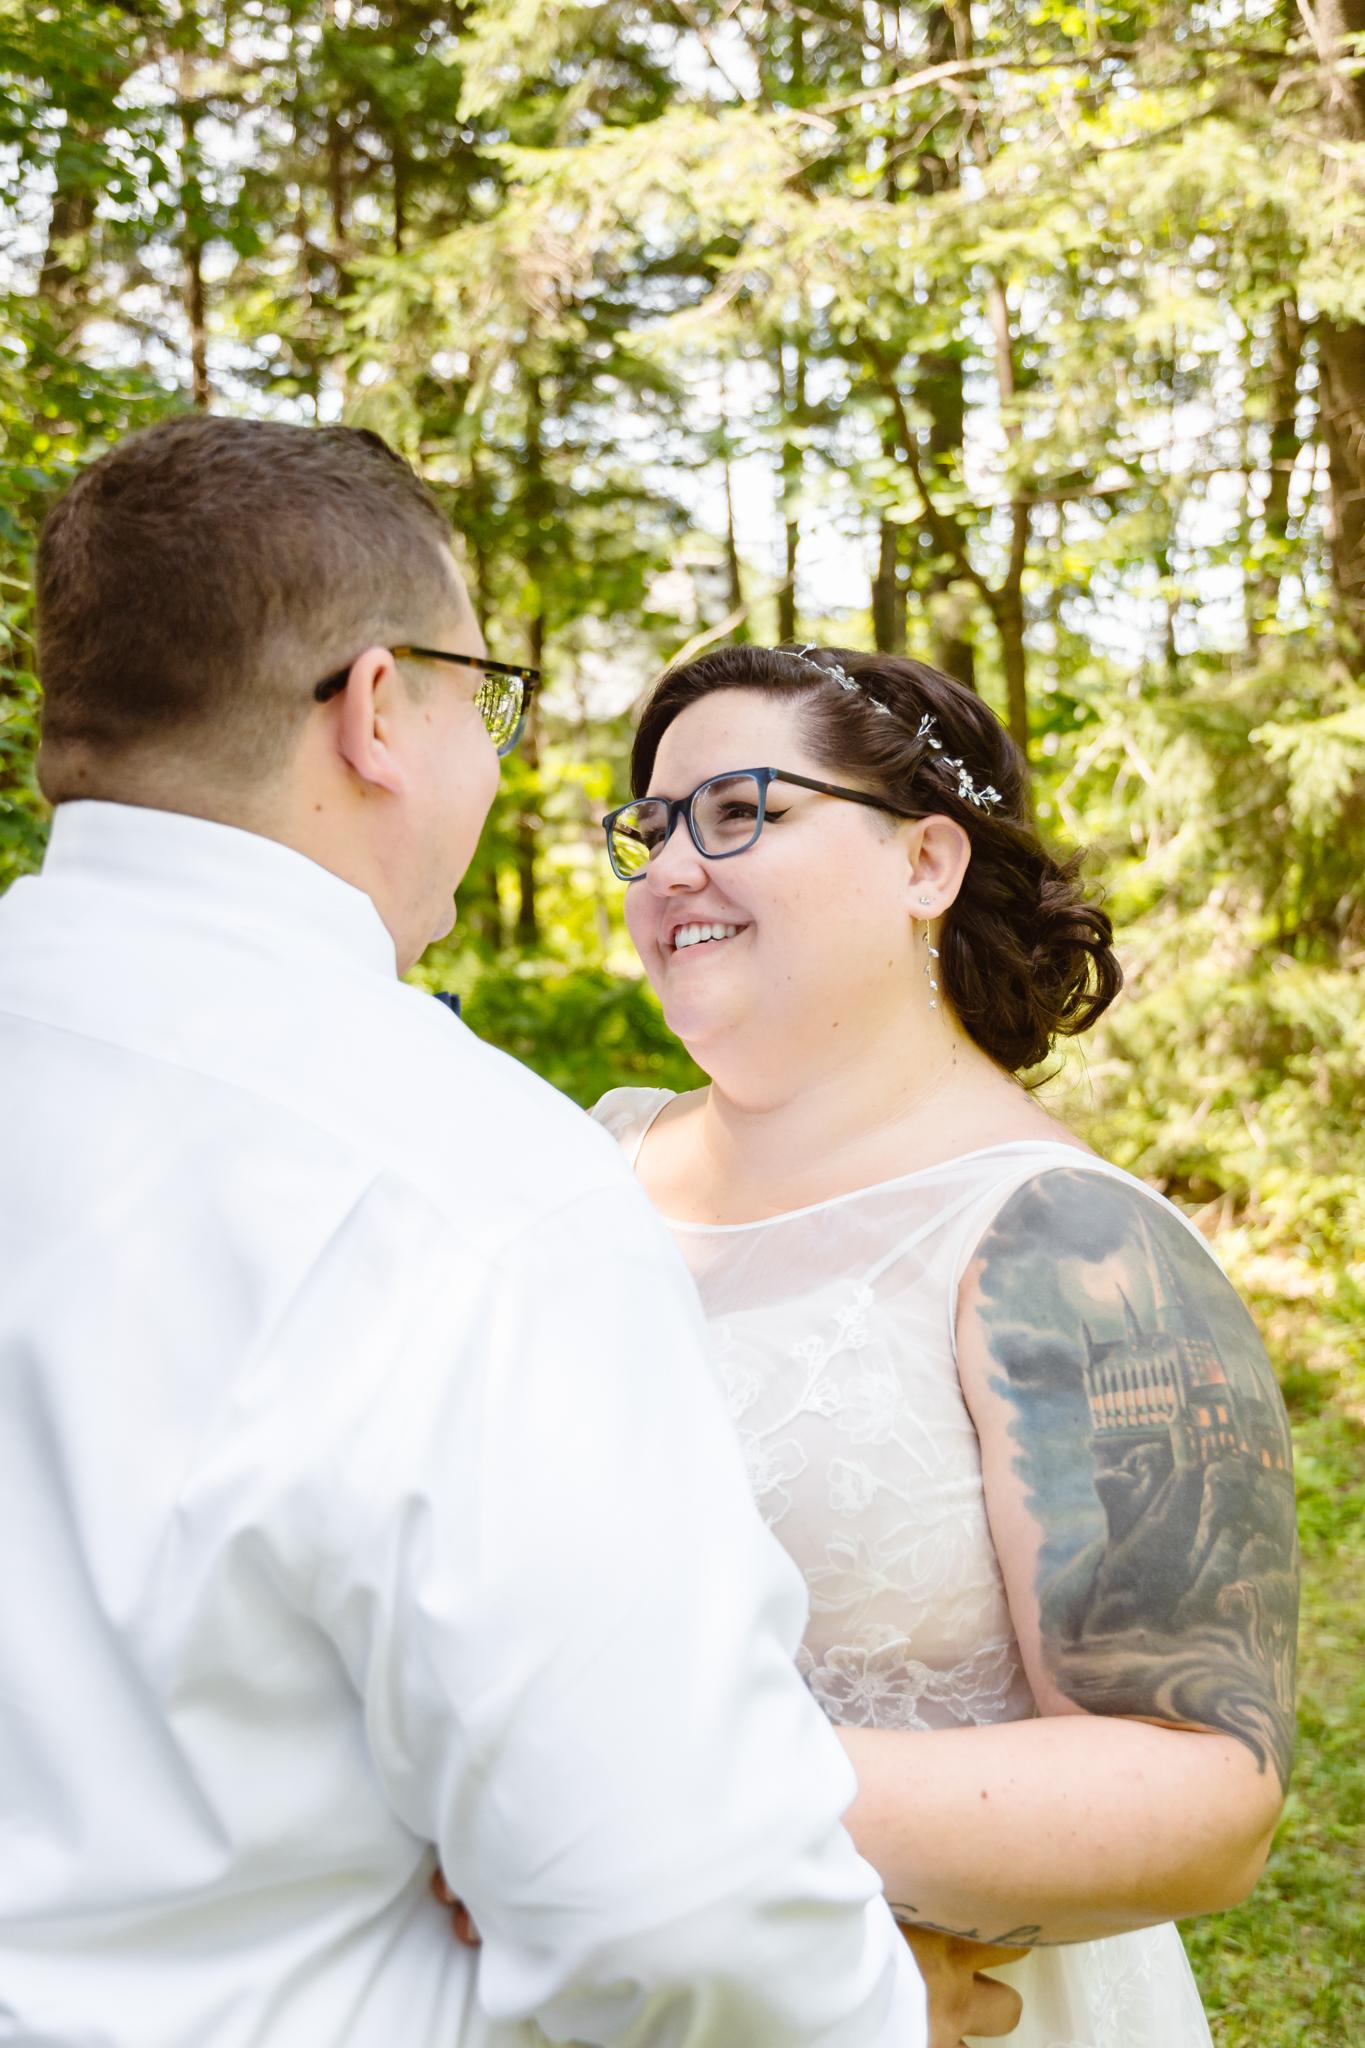 Vermont-Wedding-080119-WEBsize-181.jpg